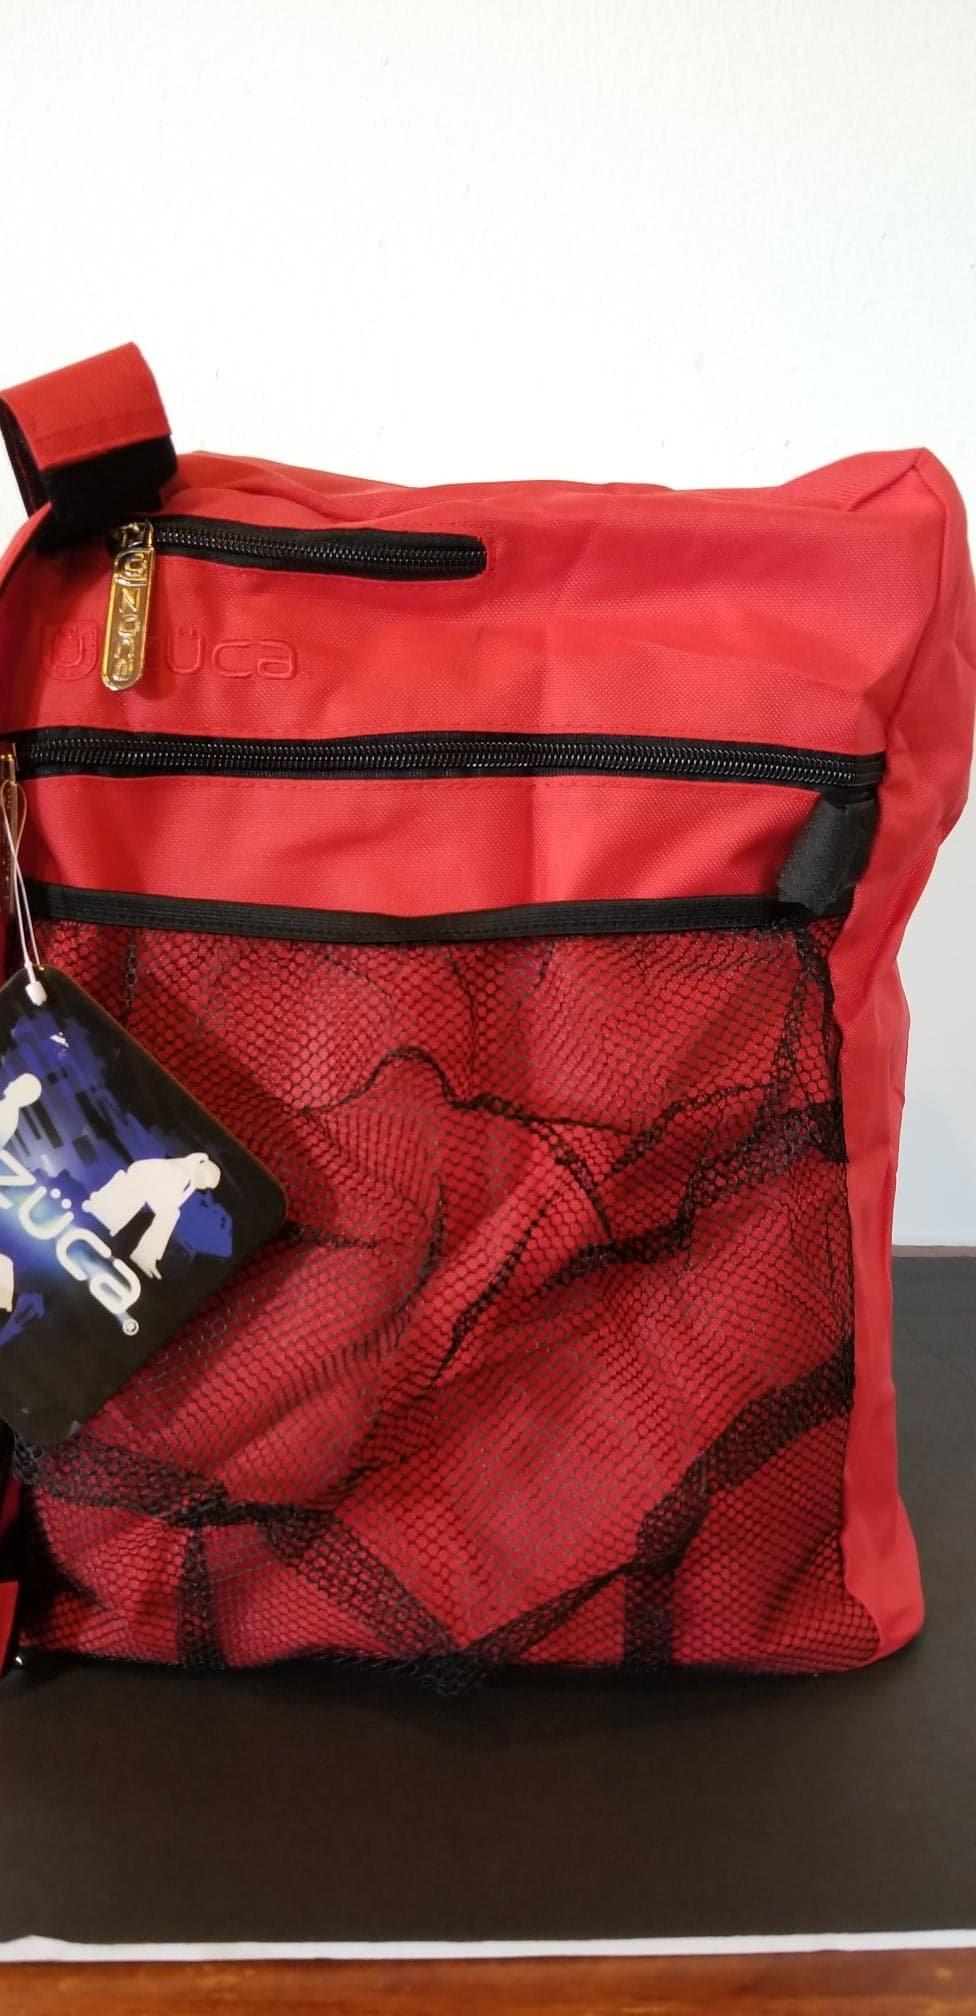 ZUCA Sport Insert Bag/Color red NO Frame Included